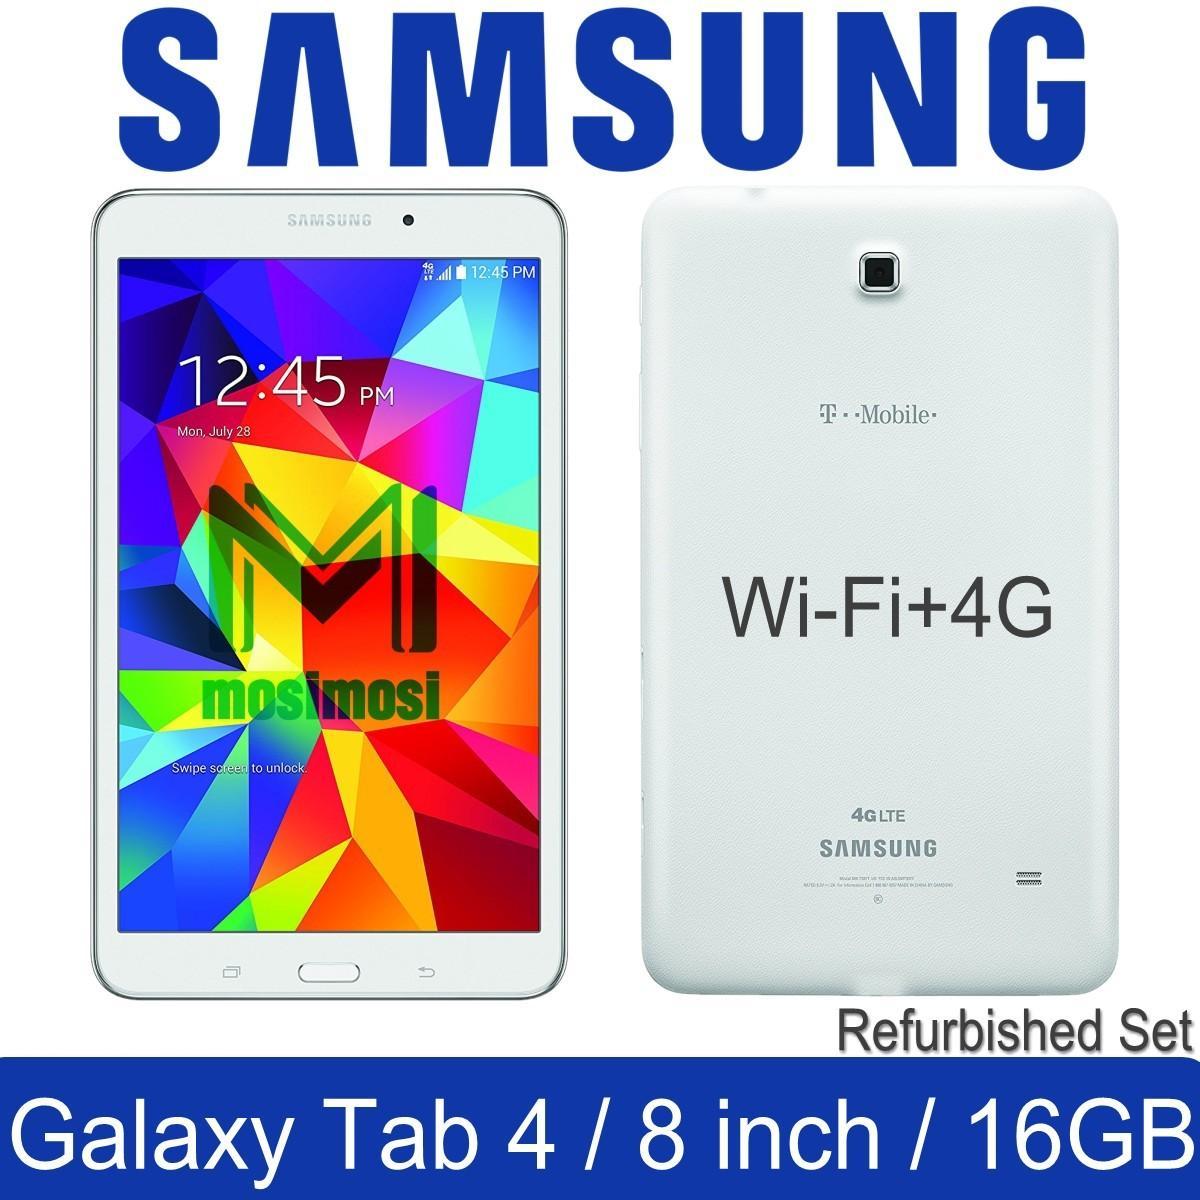 Samsung Galaxy Tab 4 (Wi-Fi+4G) (Refurbish Set)